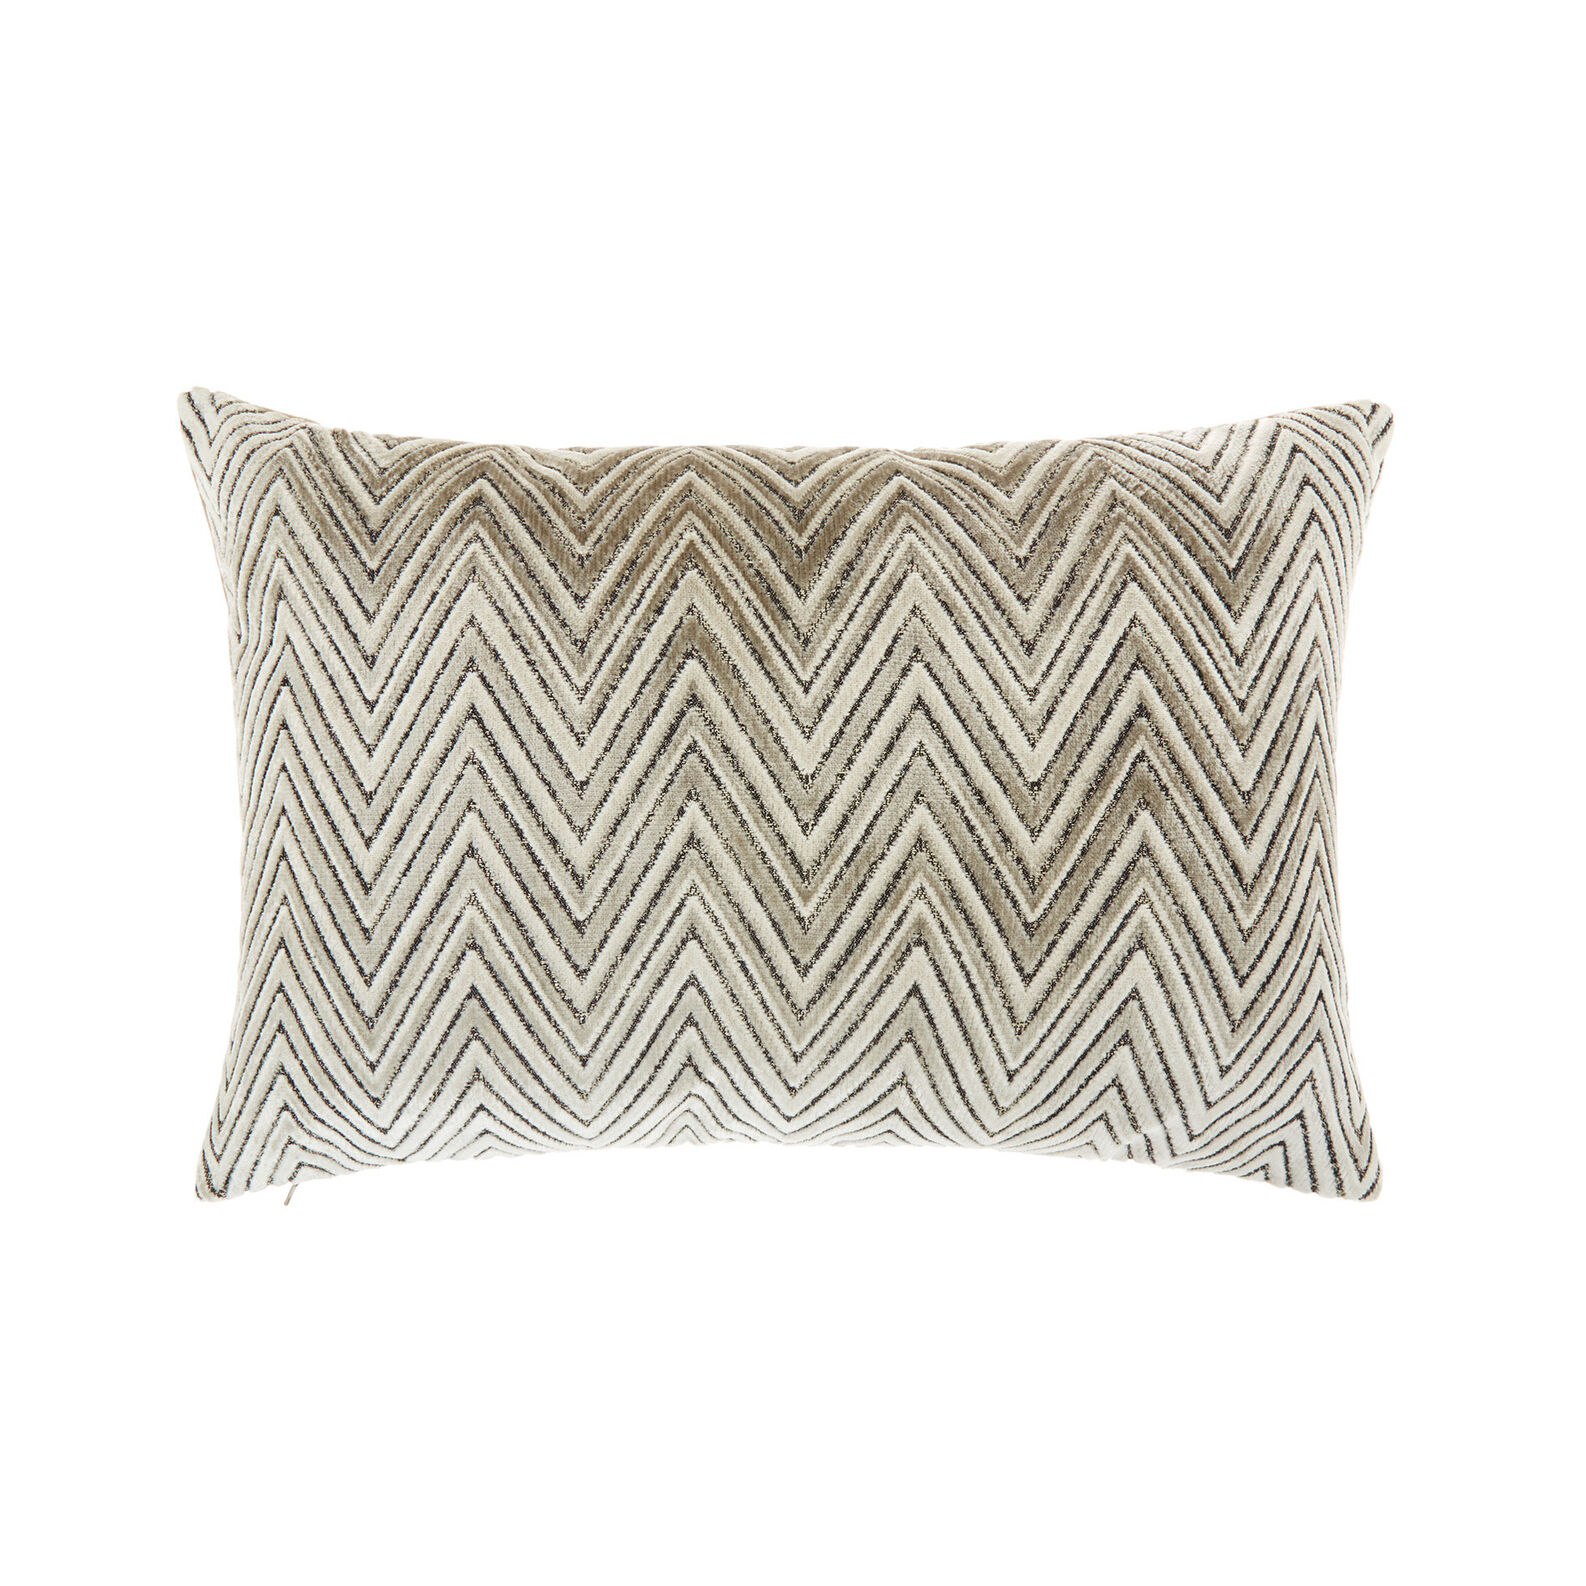 Zigzag corduroy cushion (35x55cm)